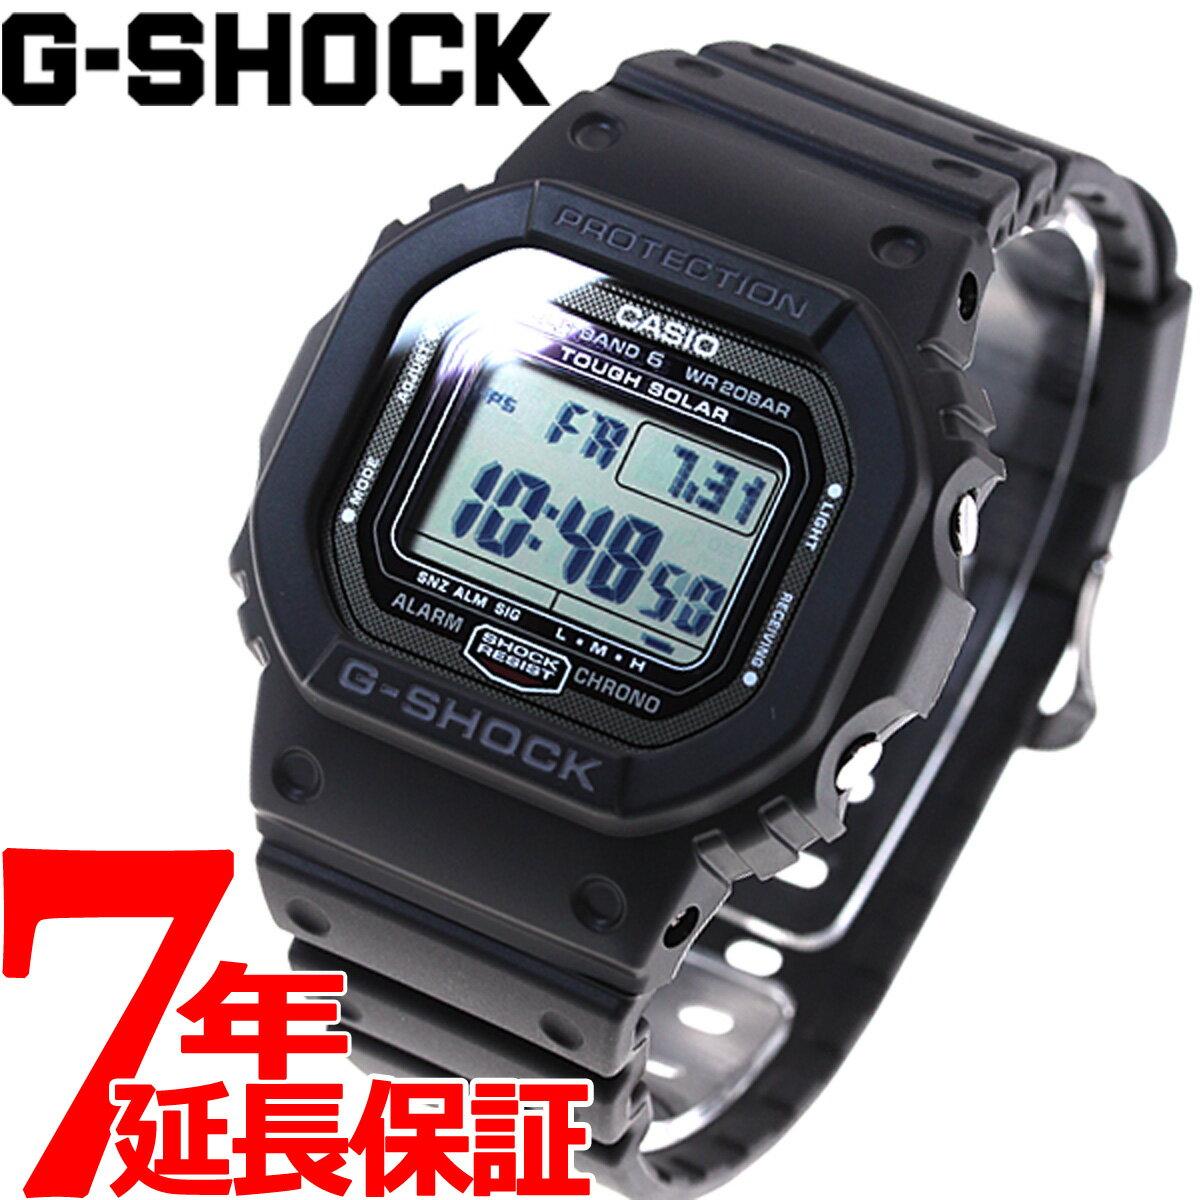 GW-5000-1JF カシオ Gショック 電波時計 GW-5000-1JF CASIO G-SHOCK